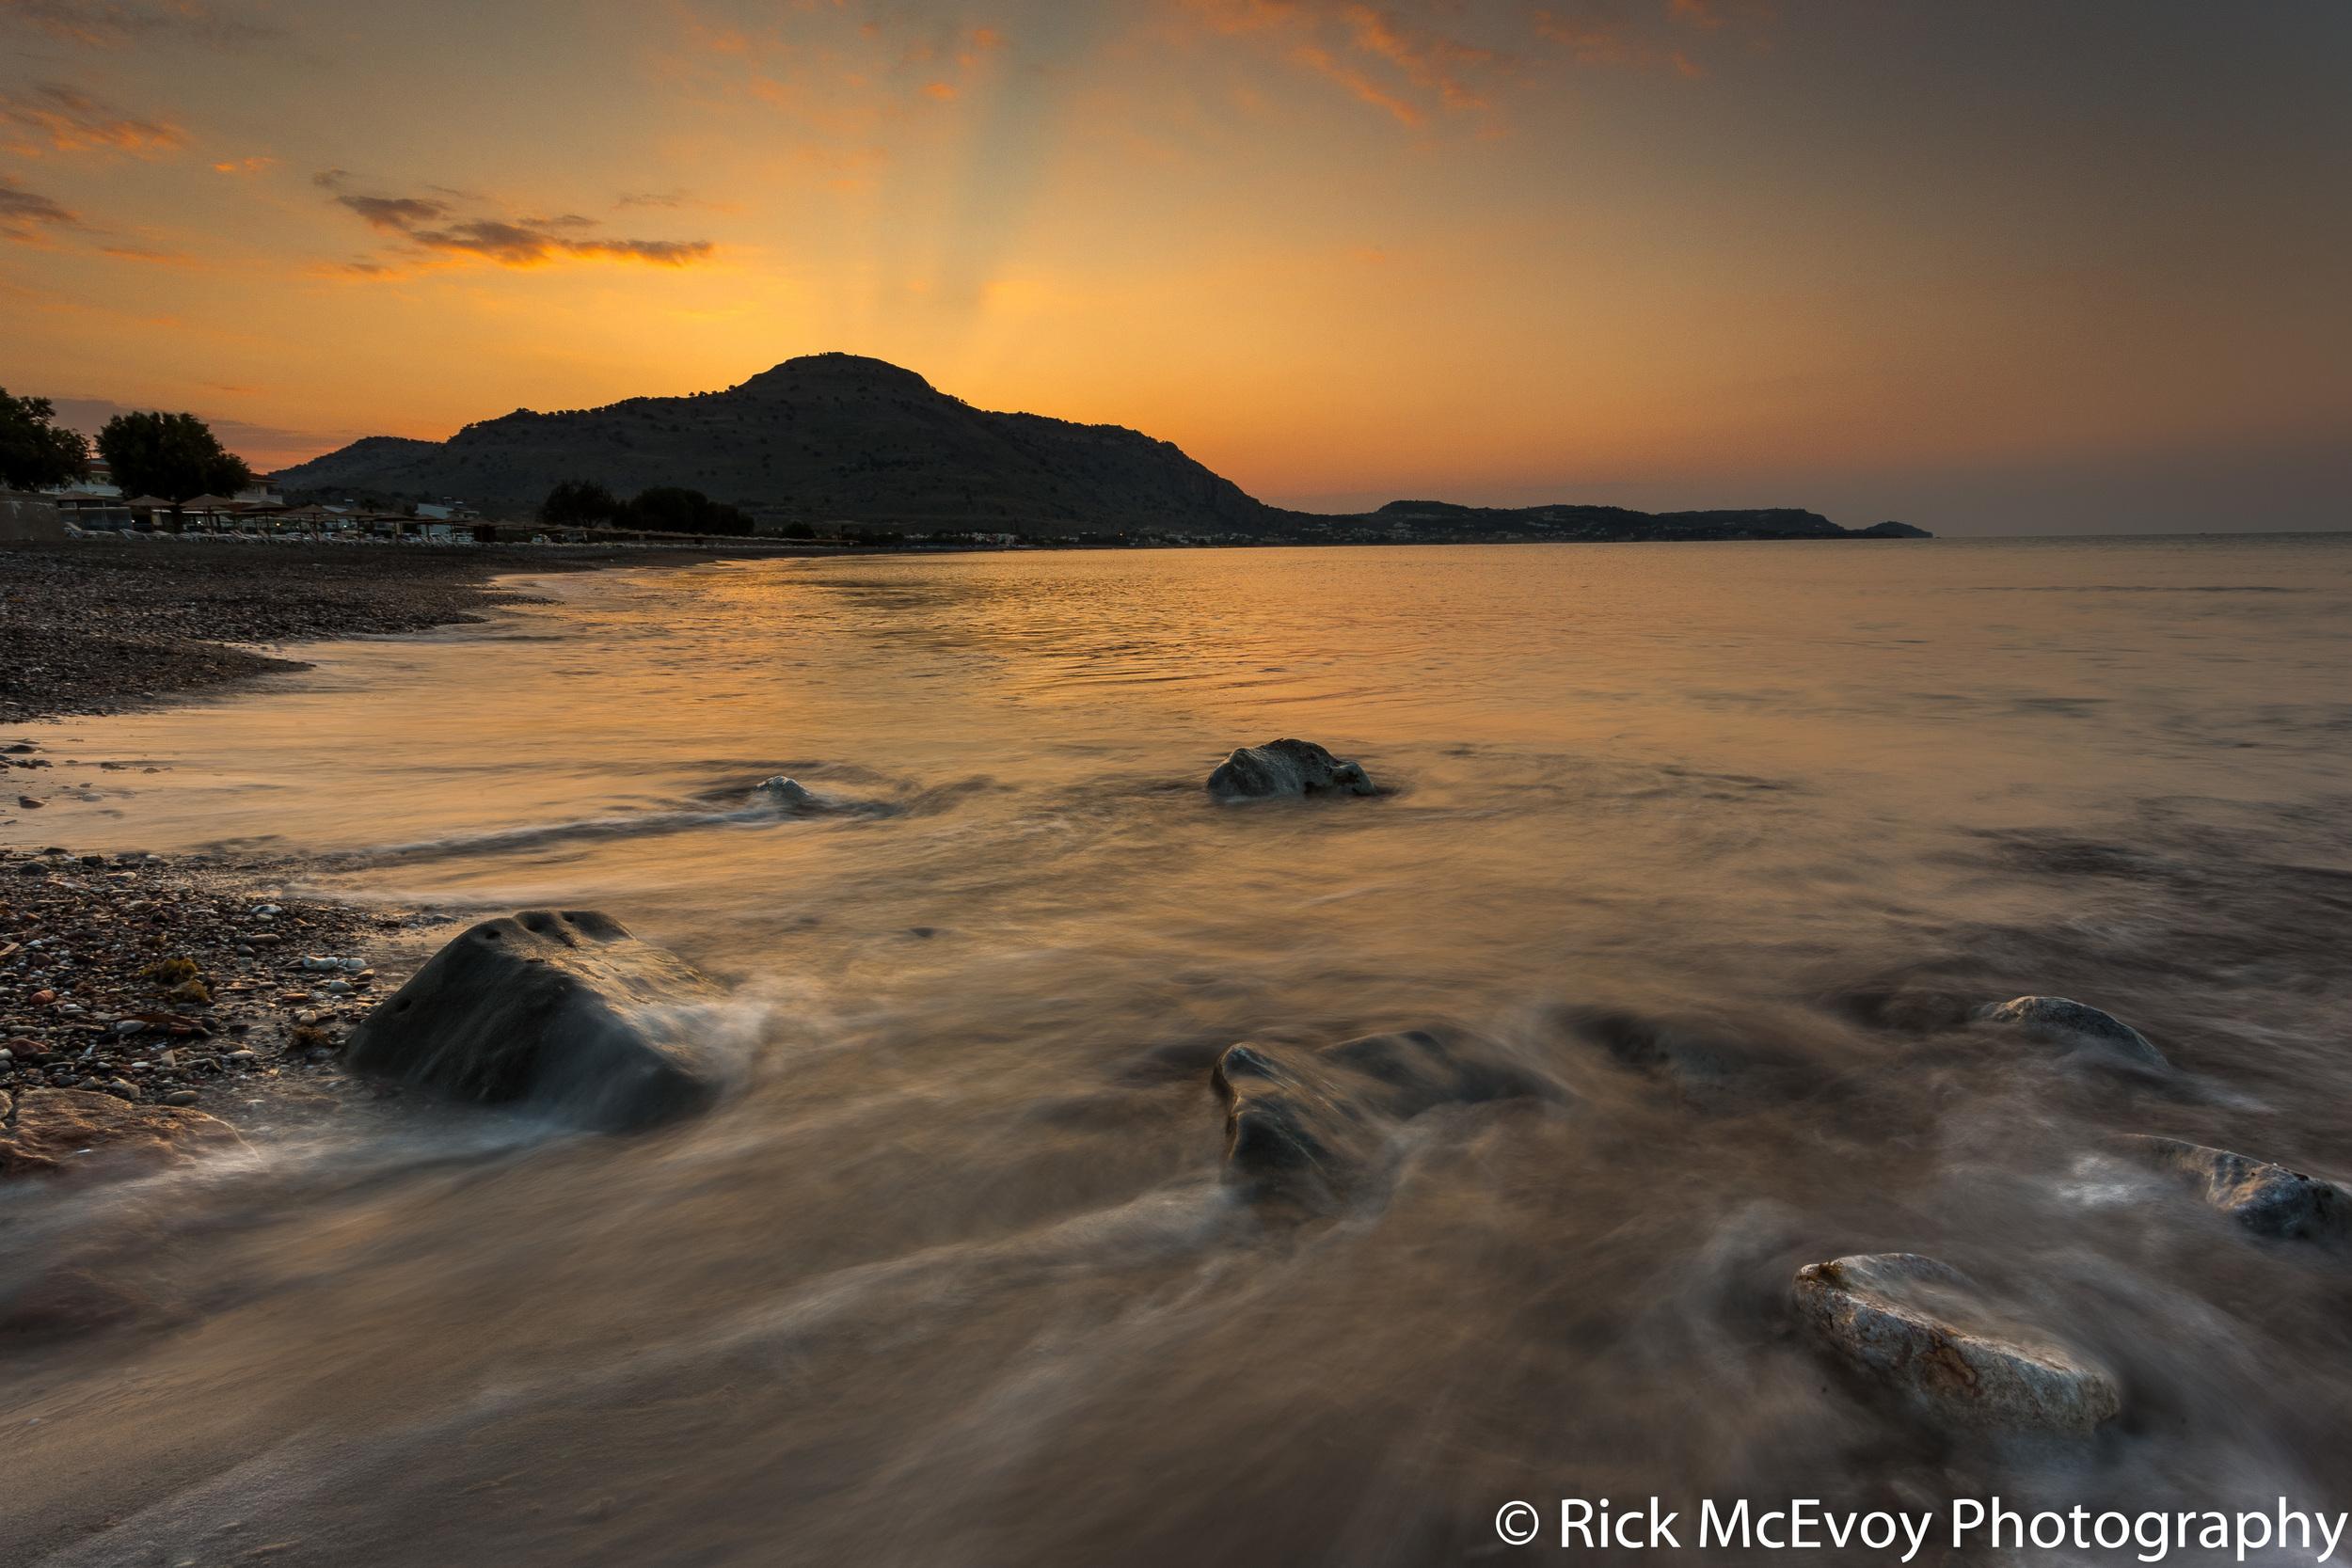 Sunrise, Greece, taken using my Manfrotto Pixi